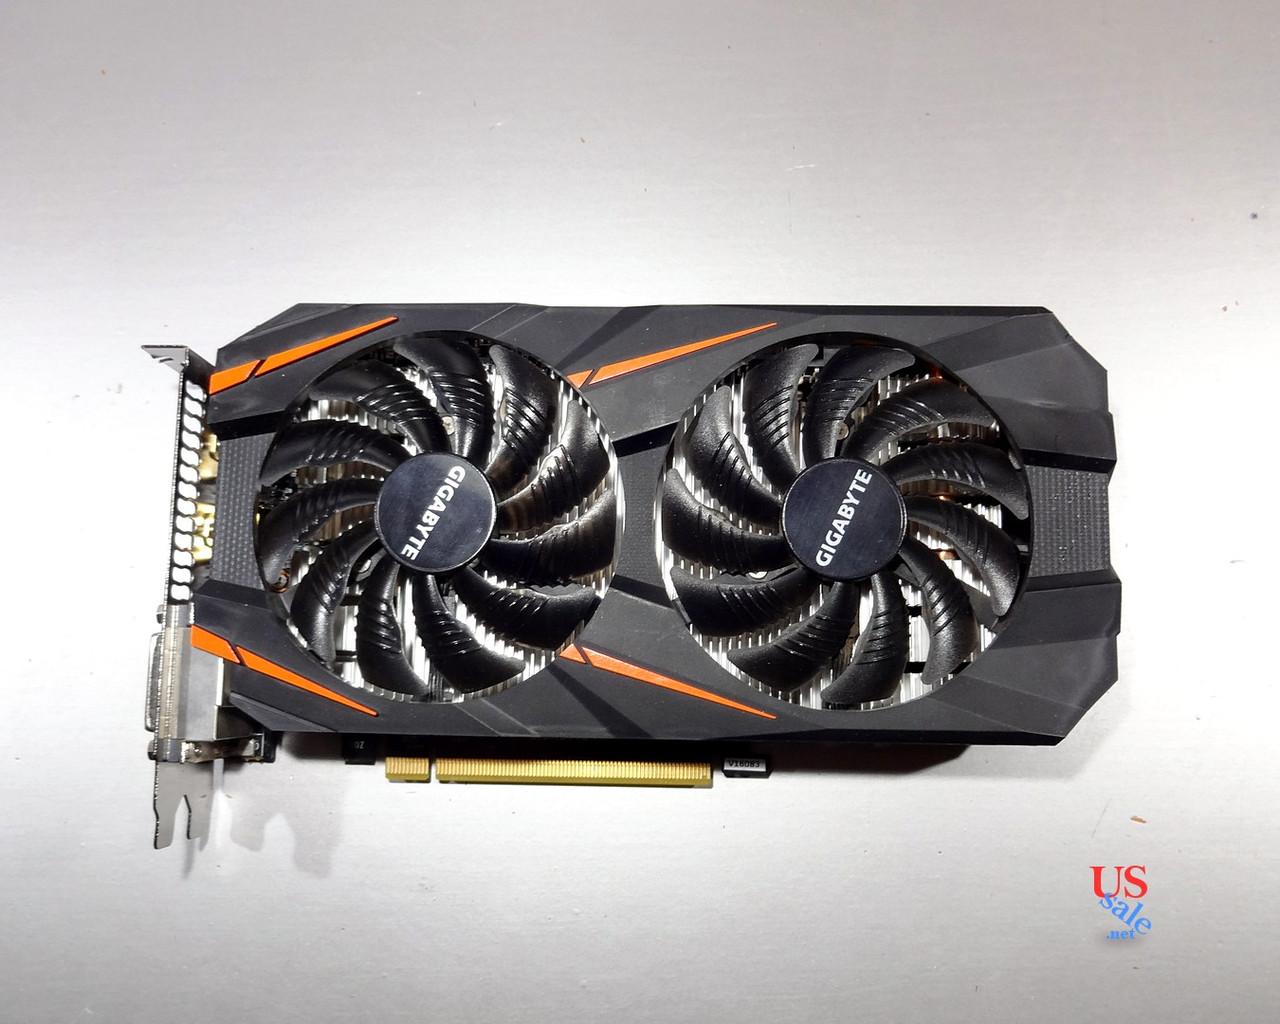 Видеокарта Gigabyte GeForce GTX 1060 3Gb. Покупка без риска! Гарантия!